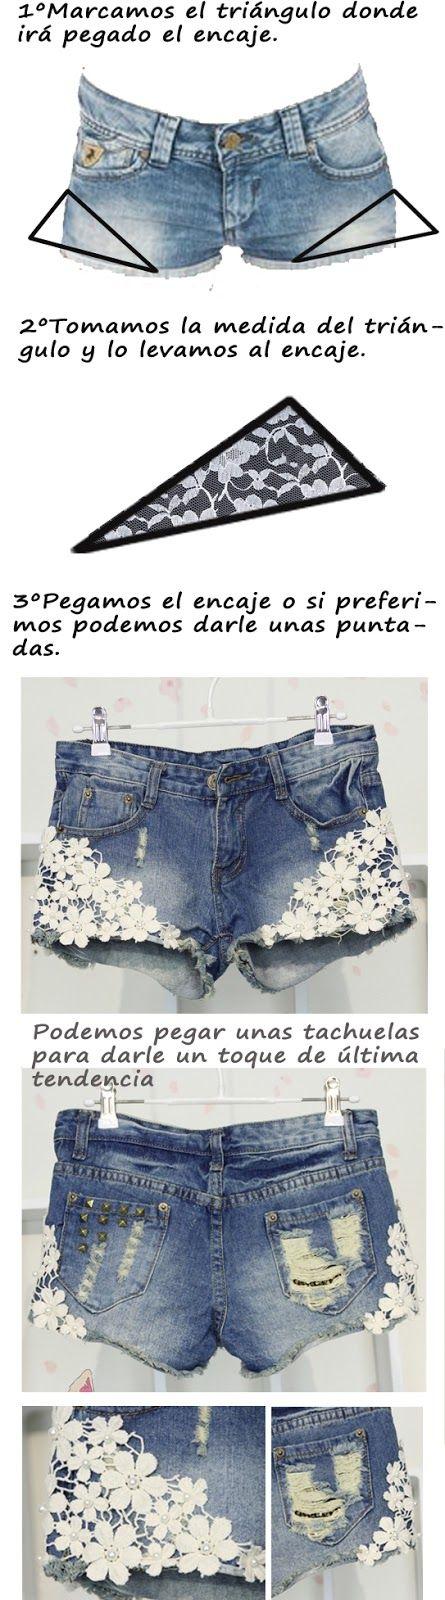 DIY shorts con encaje | BestLookzone | alice | Pinterest | Nähen ...